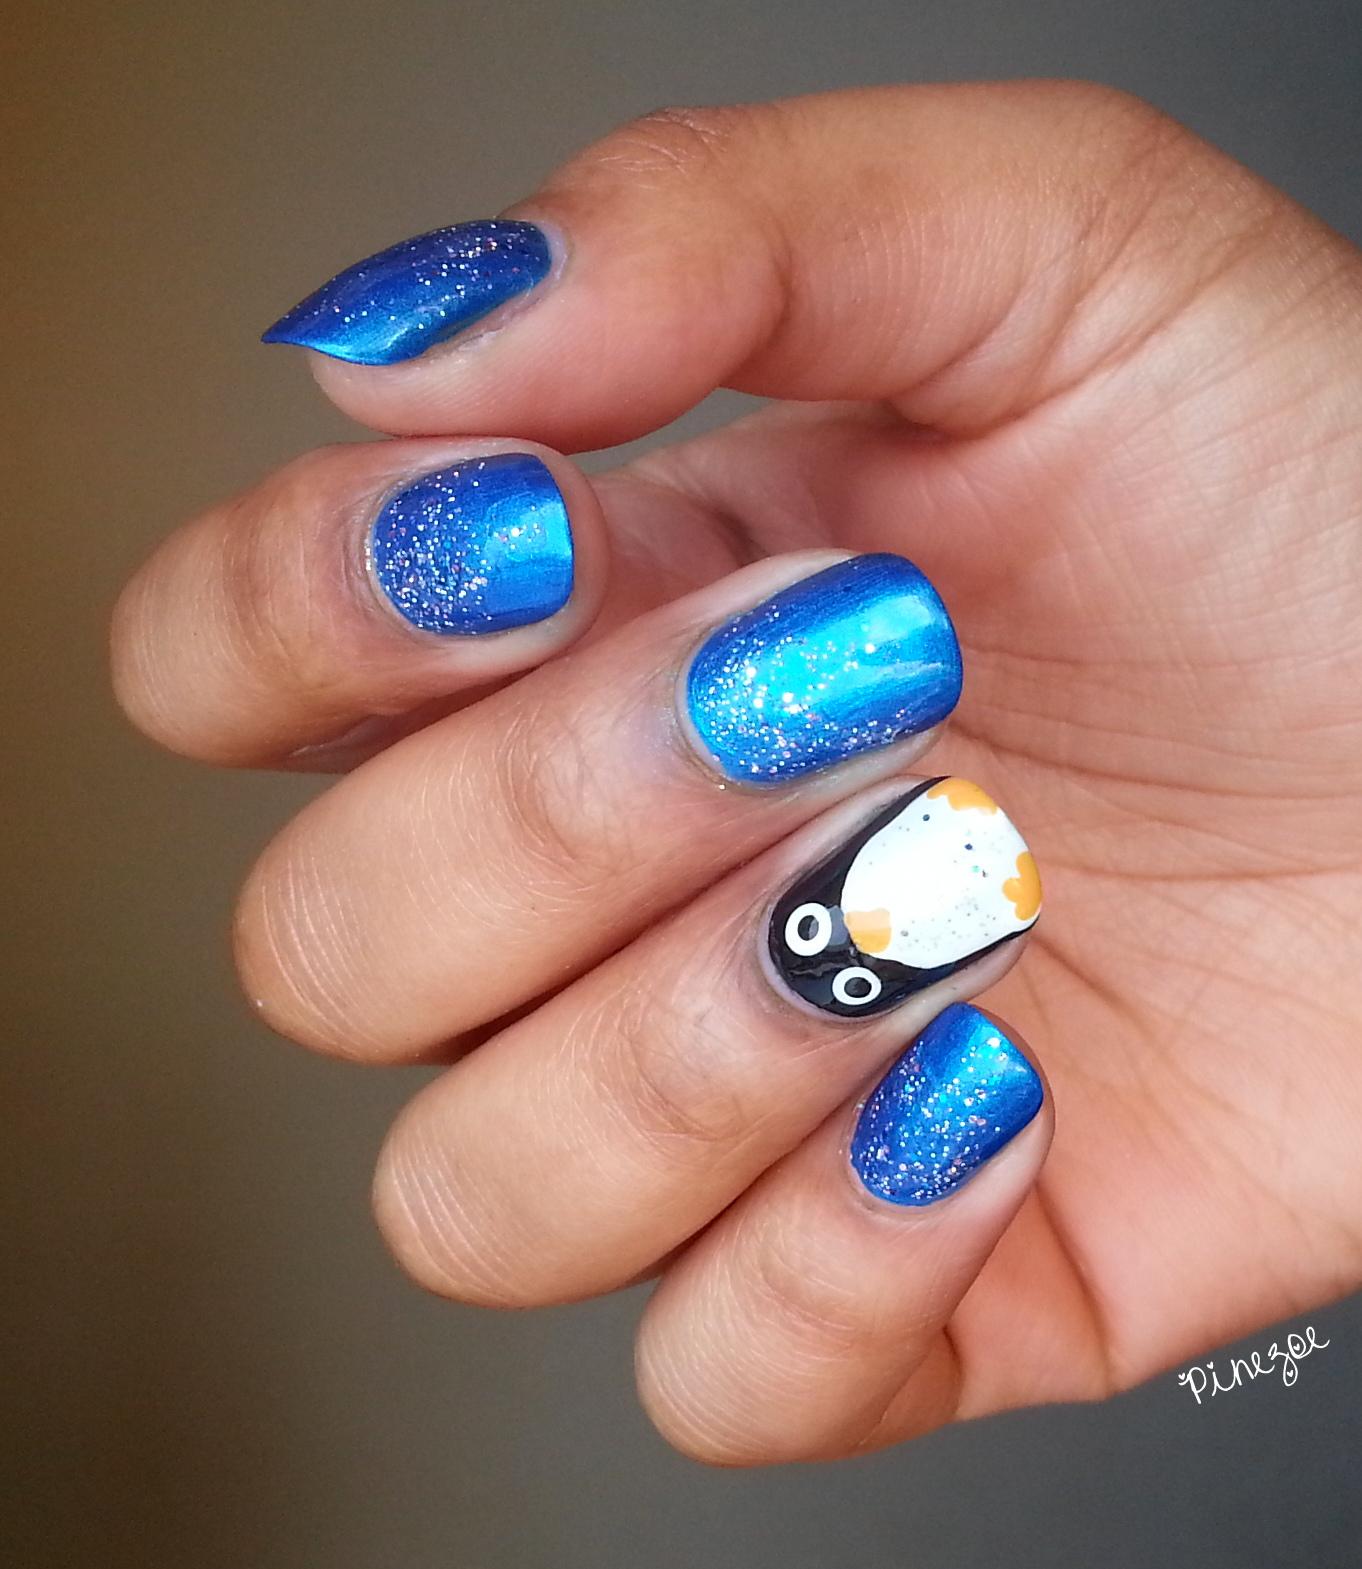 Nail Art Pingouin - Penguin Nail Art